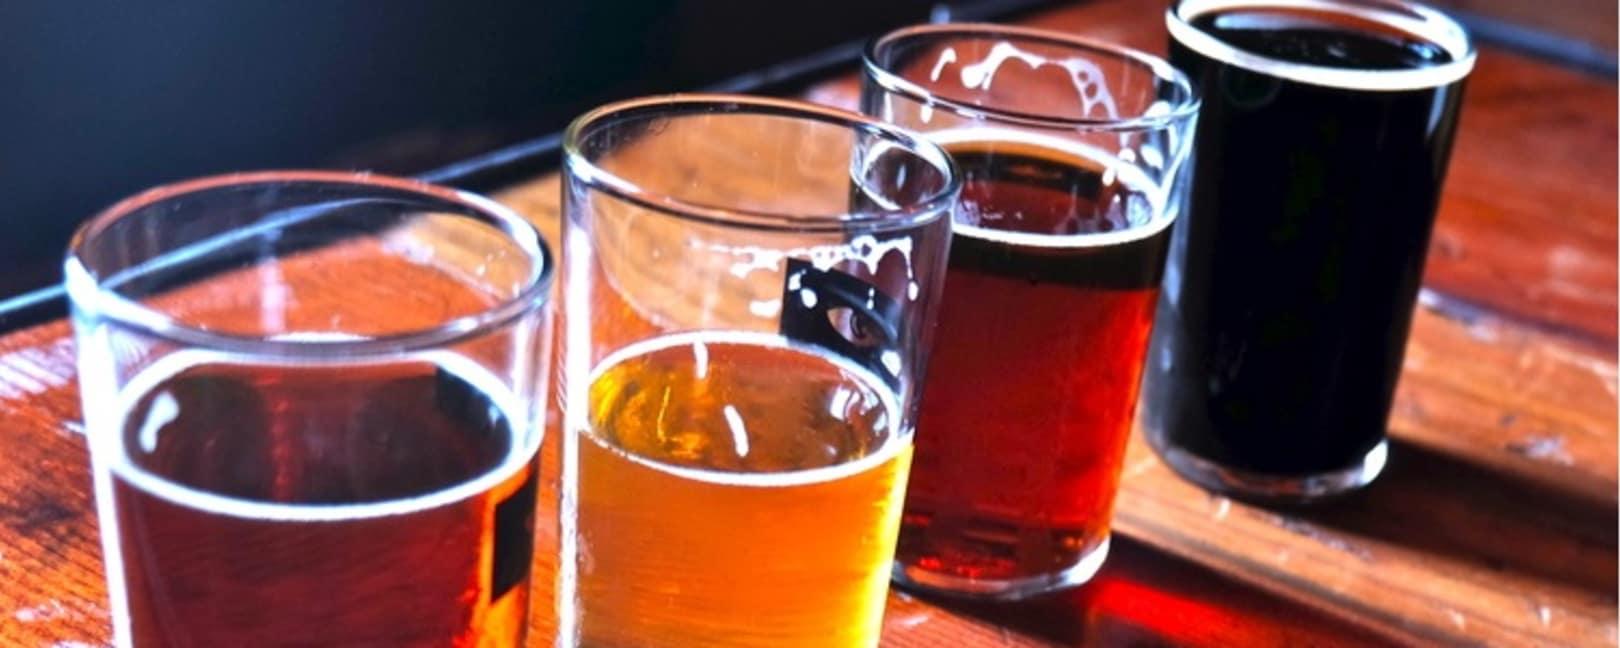 Beer flight 1 tceag1